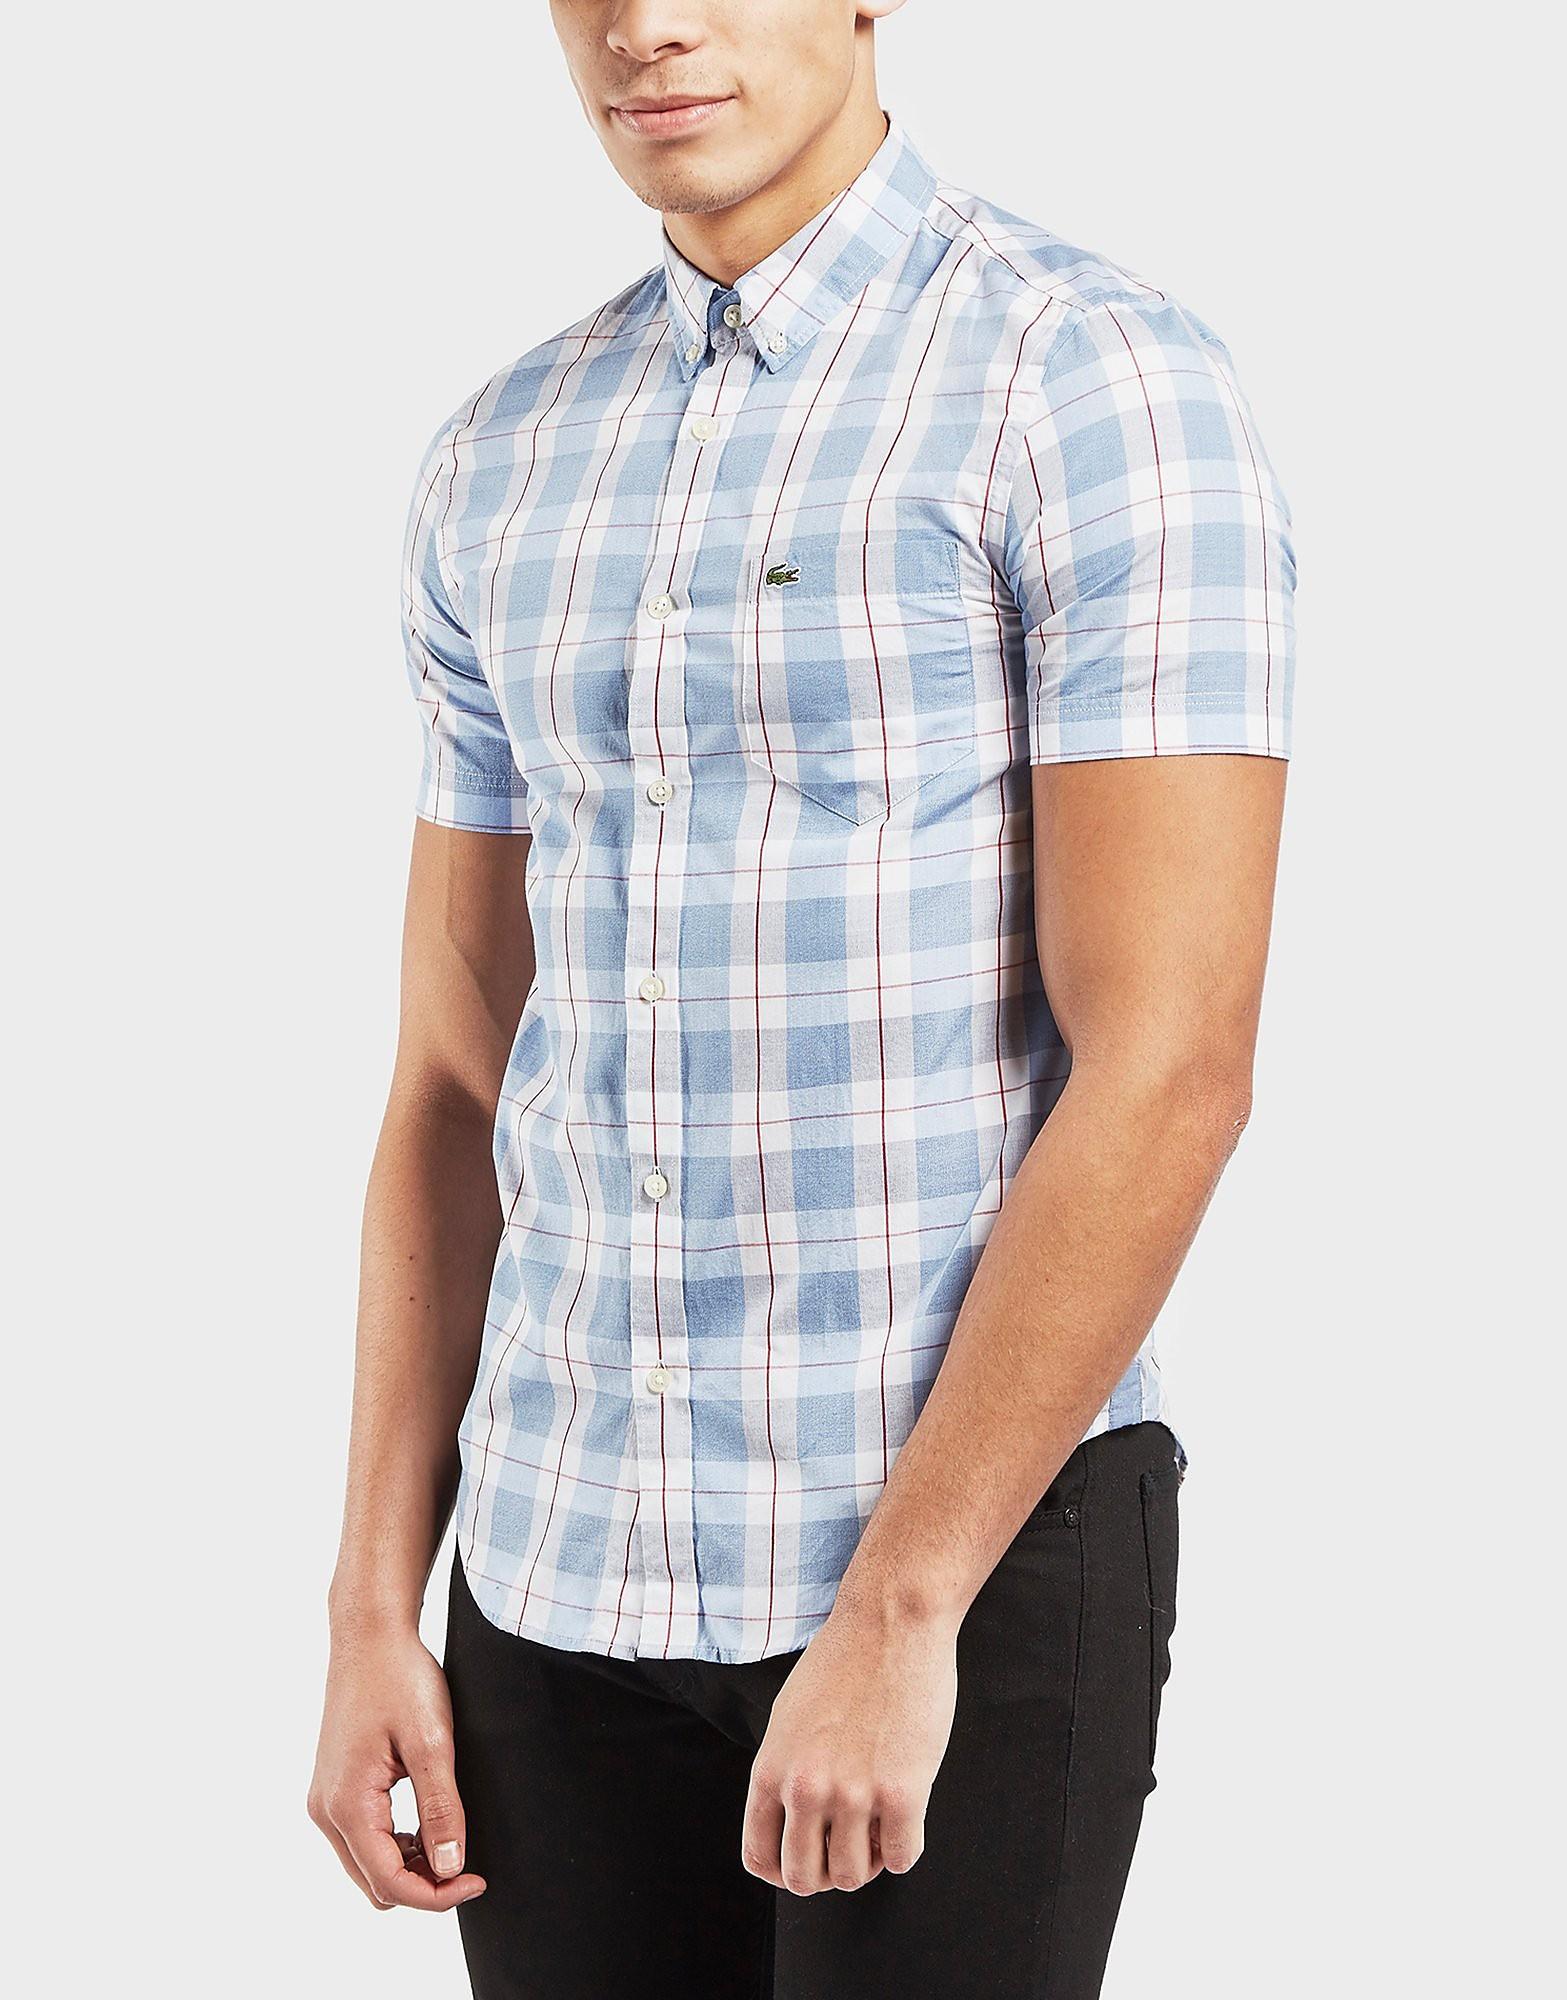 Lacoste Block Check Shirt